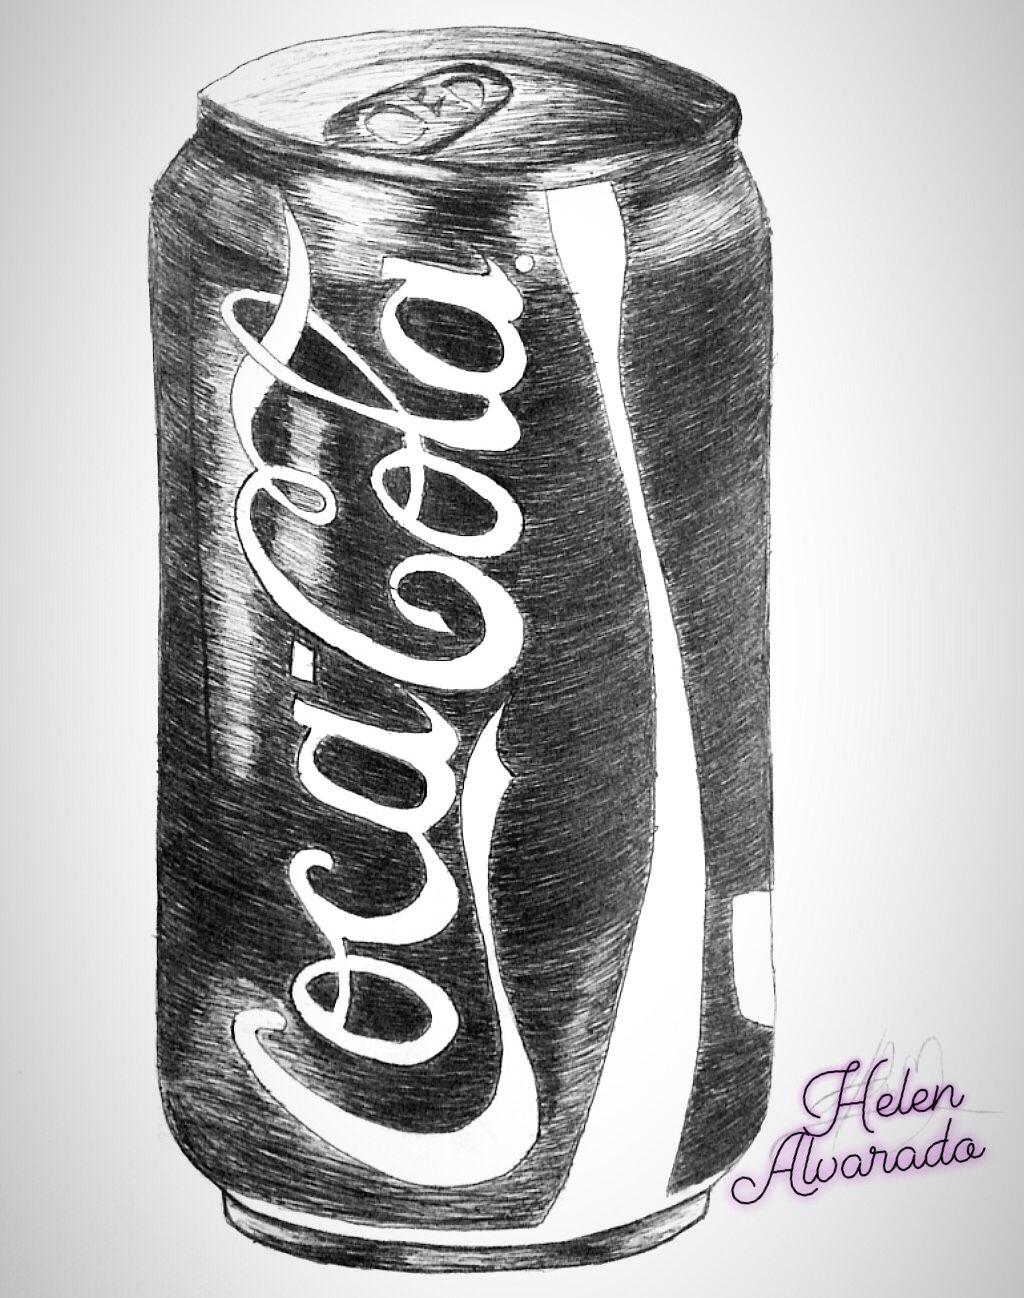 Cocacola Sketchbook Pensketch Drawings Pen Sketch Easy Still Life Drawing Lion Illustration